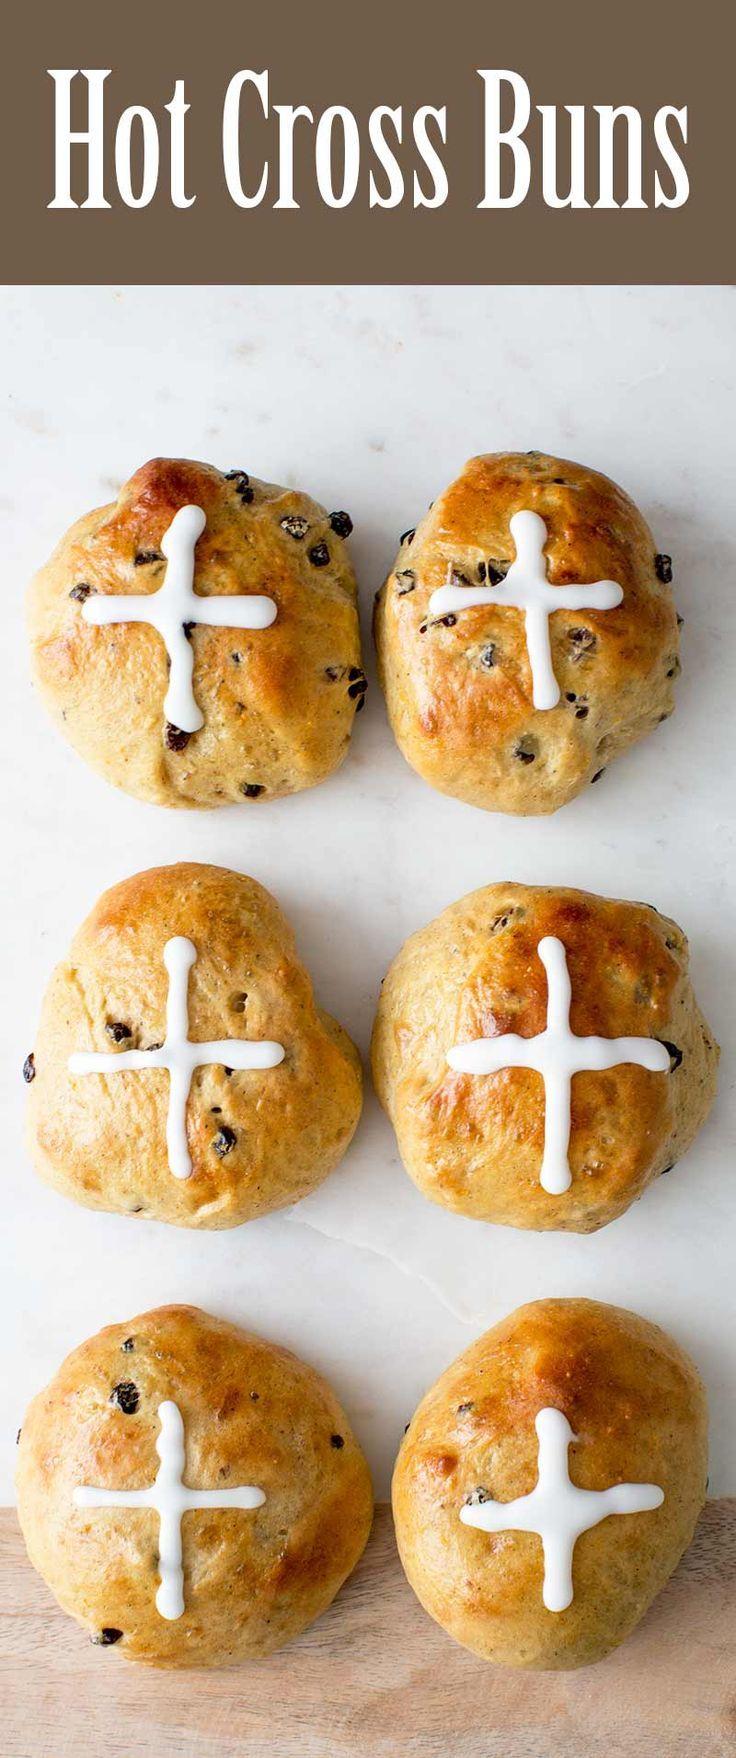 Hot Cross Buns recipe from @simplyrecipes